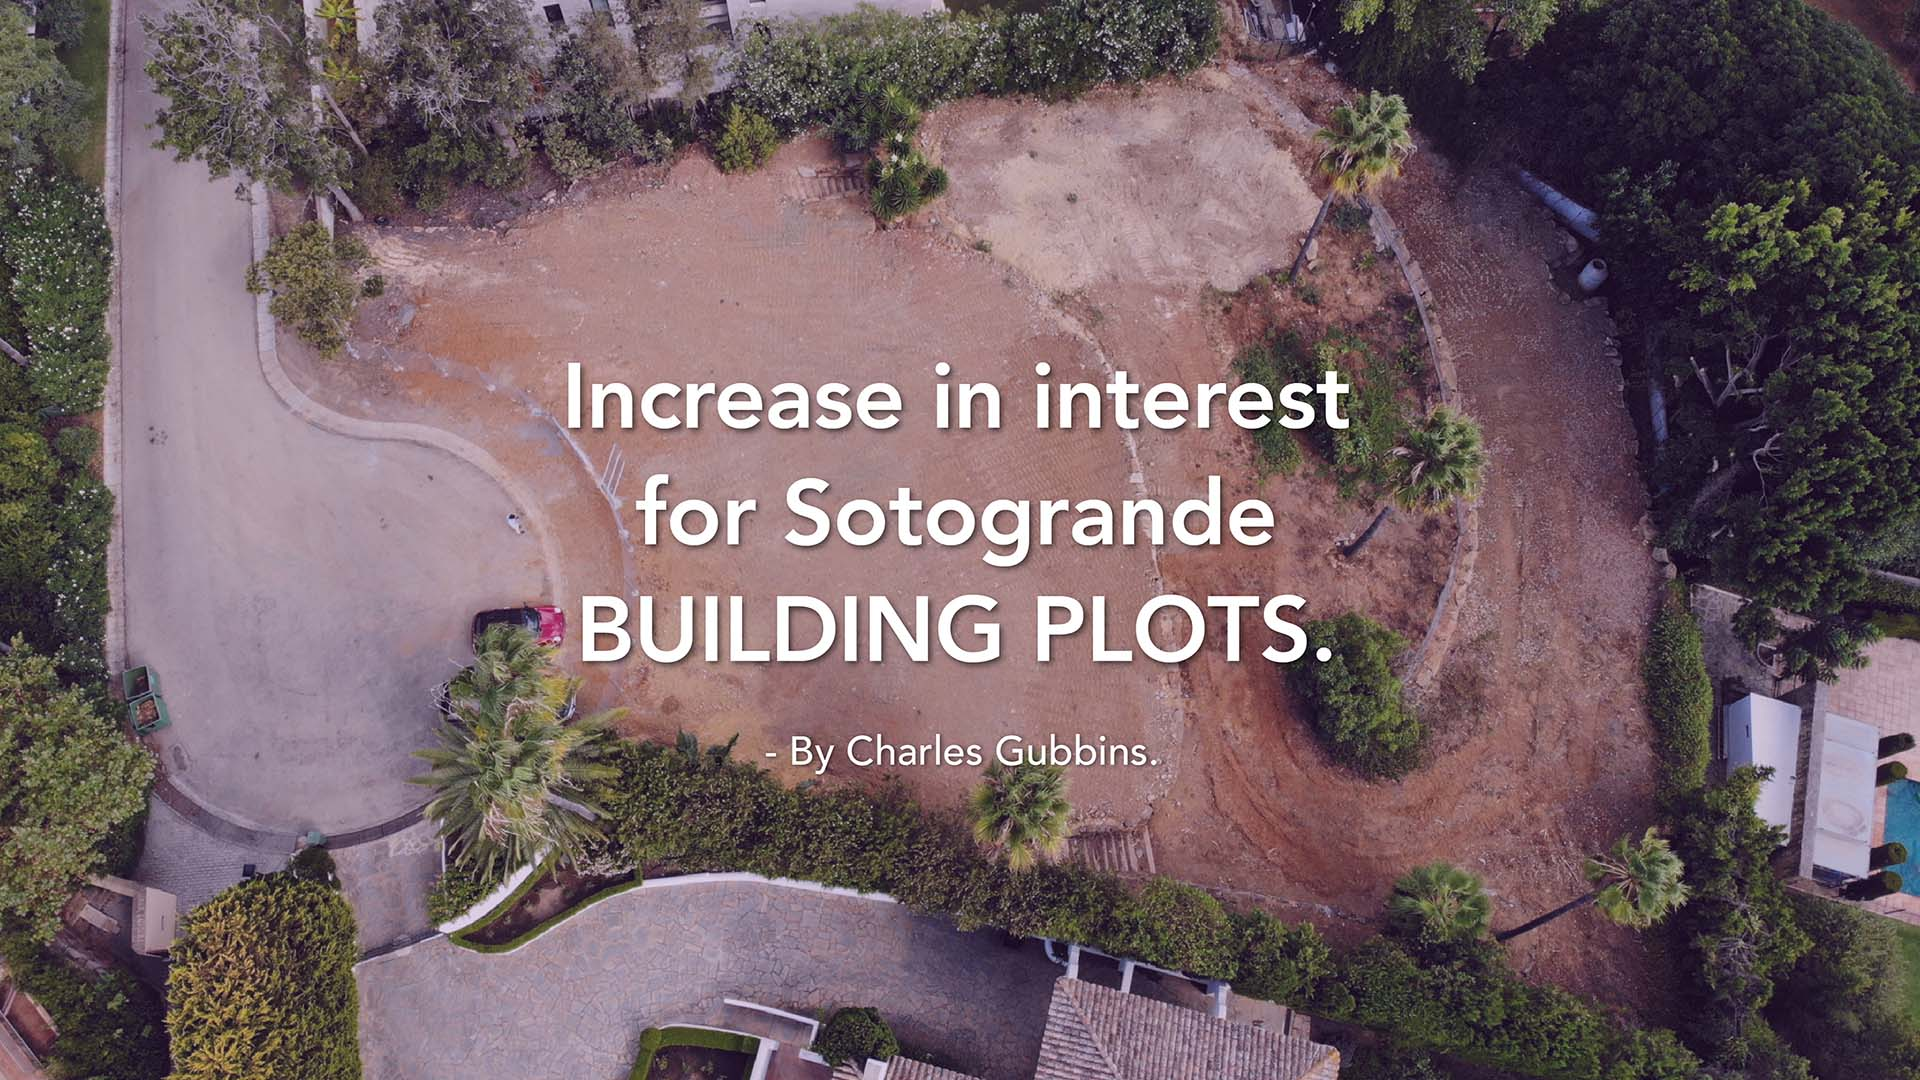 Increase interest for Sotogrande building Plots!